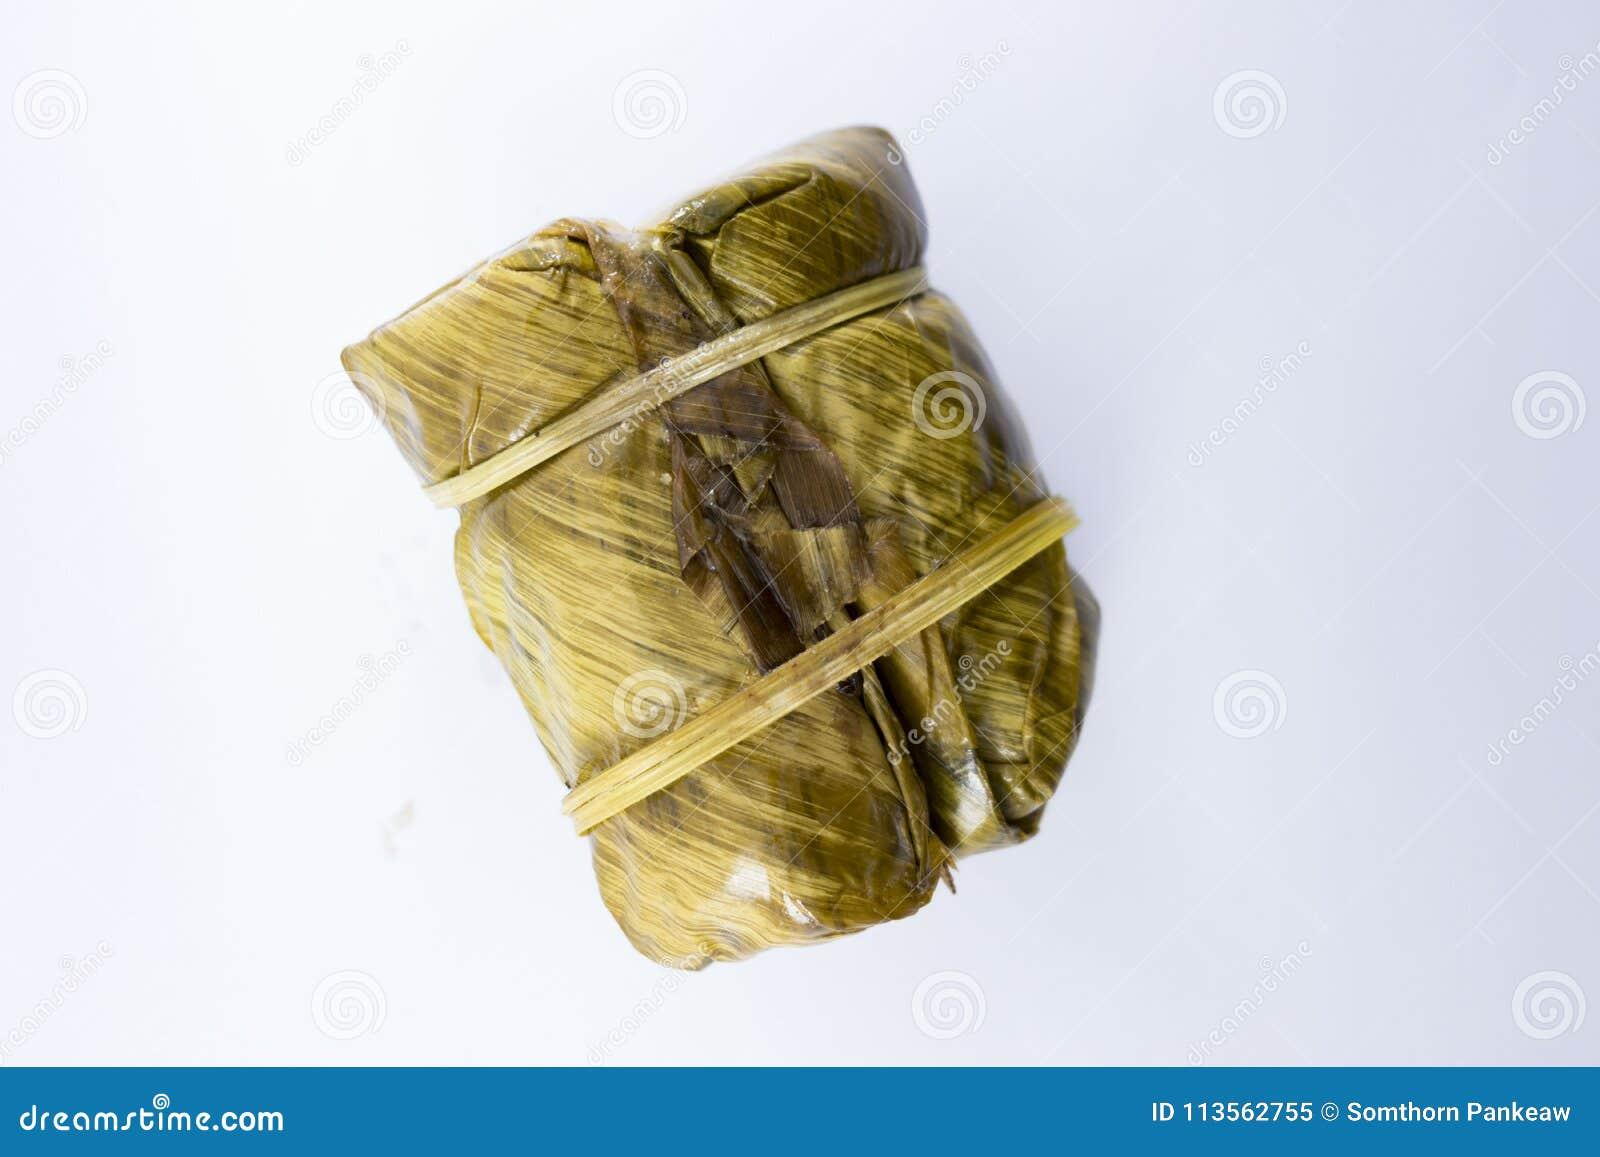 Связь каши испарилась связь каши липкого риса, десерт Таиланда